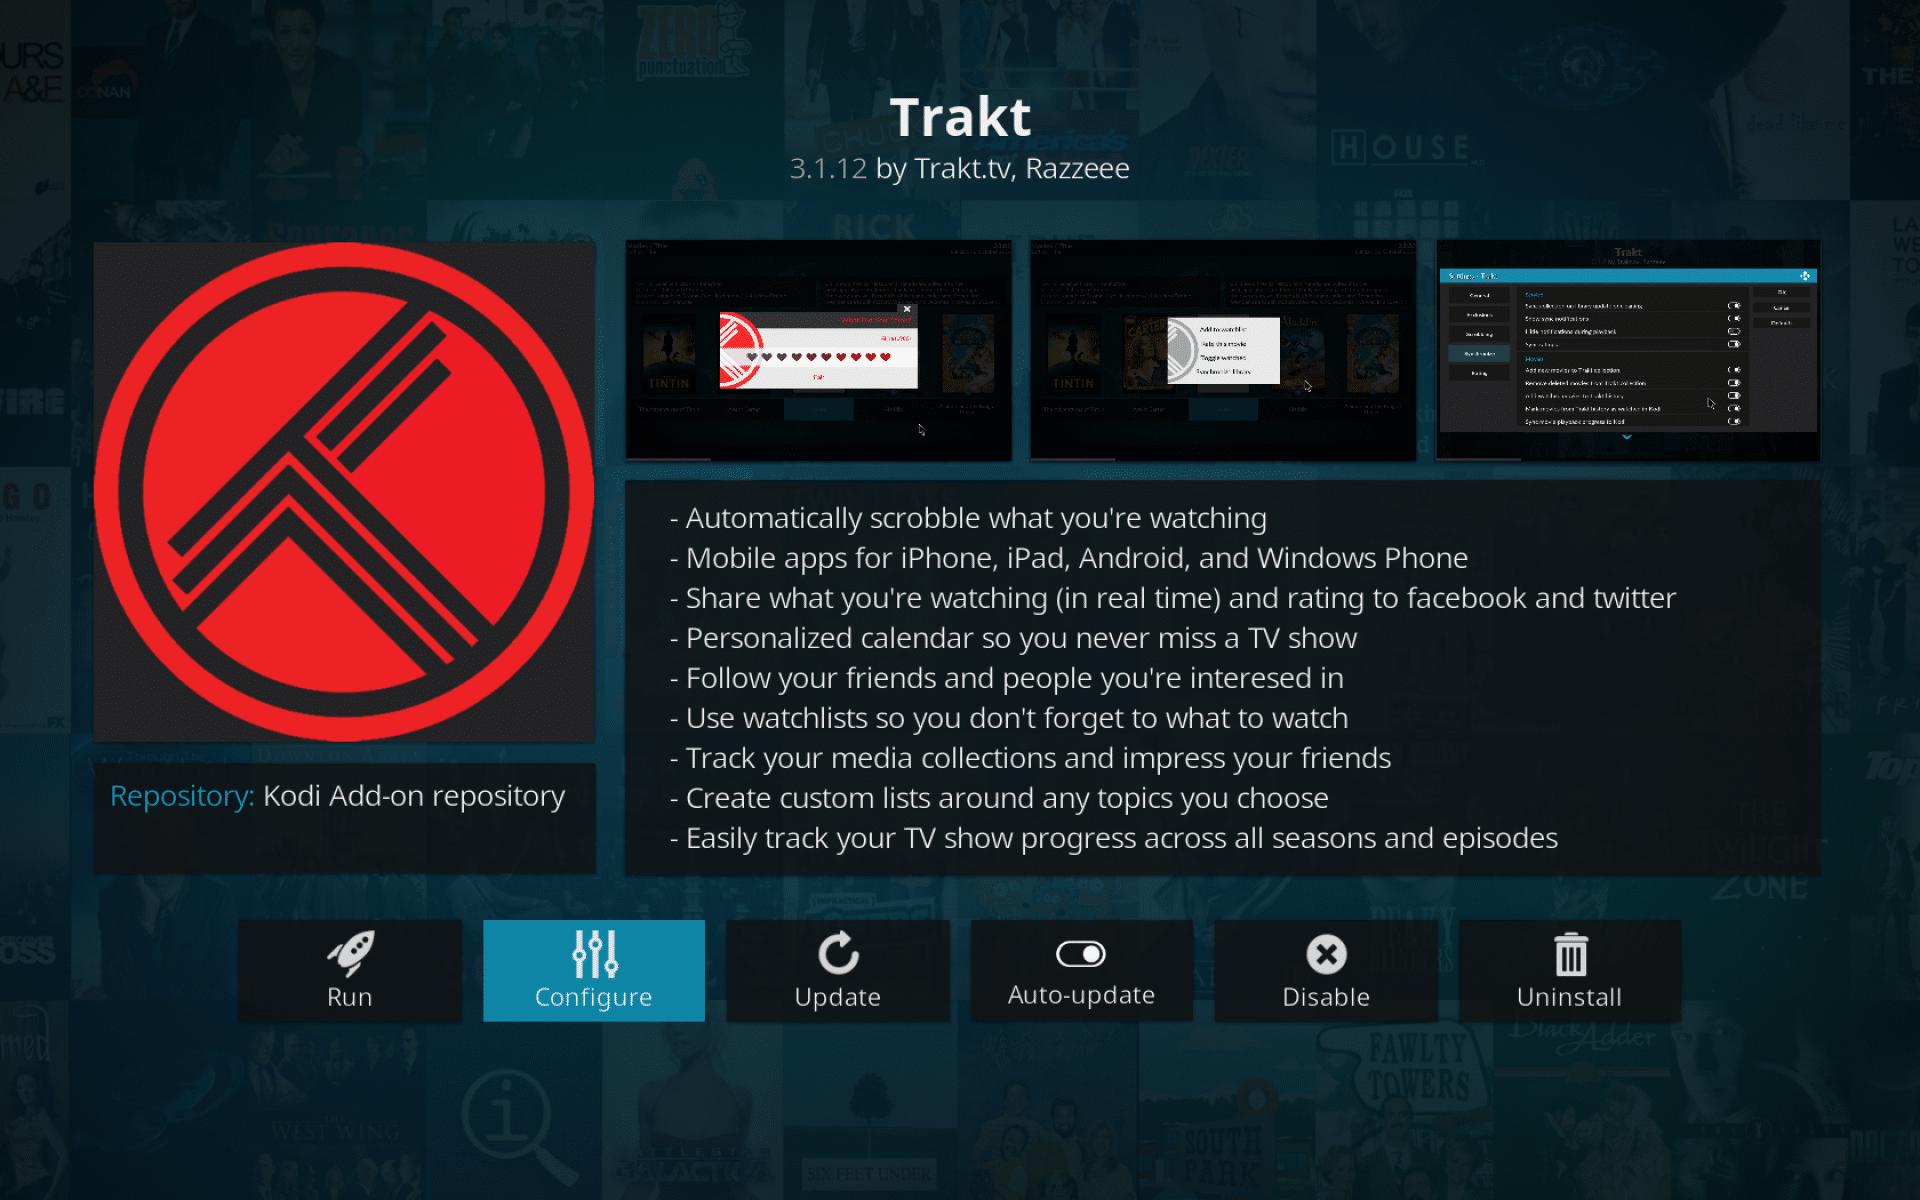 Configure Trakt settings on Kodi interface